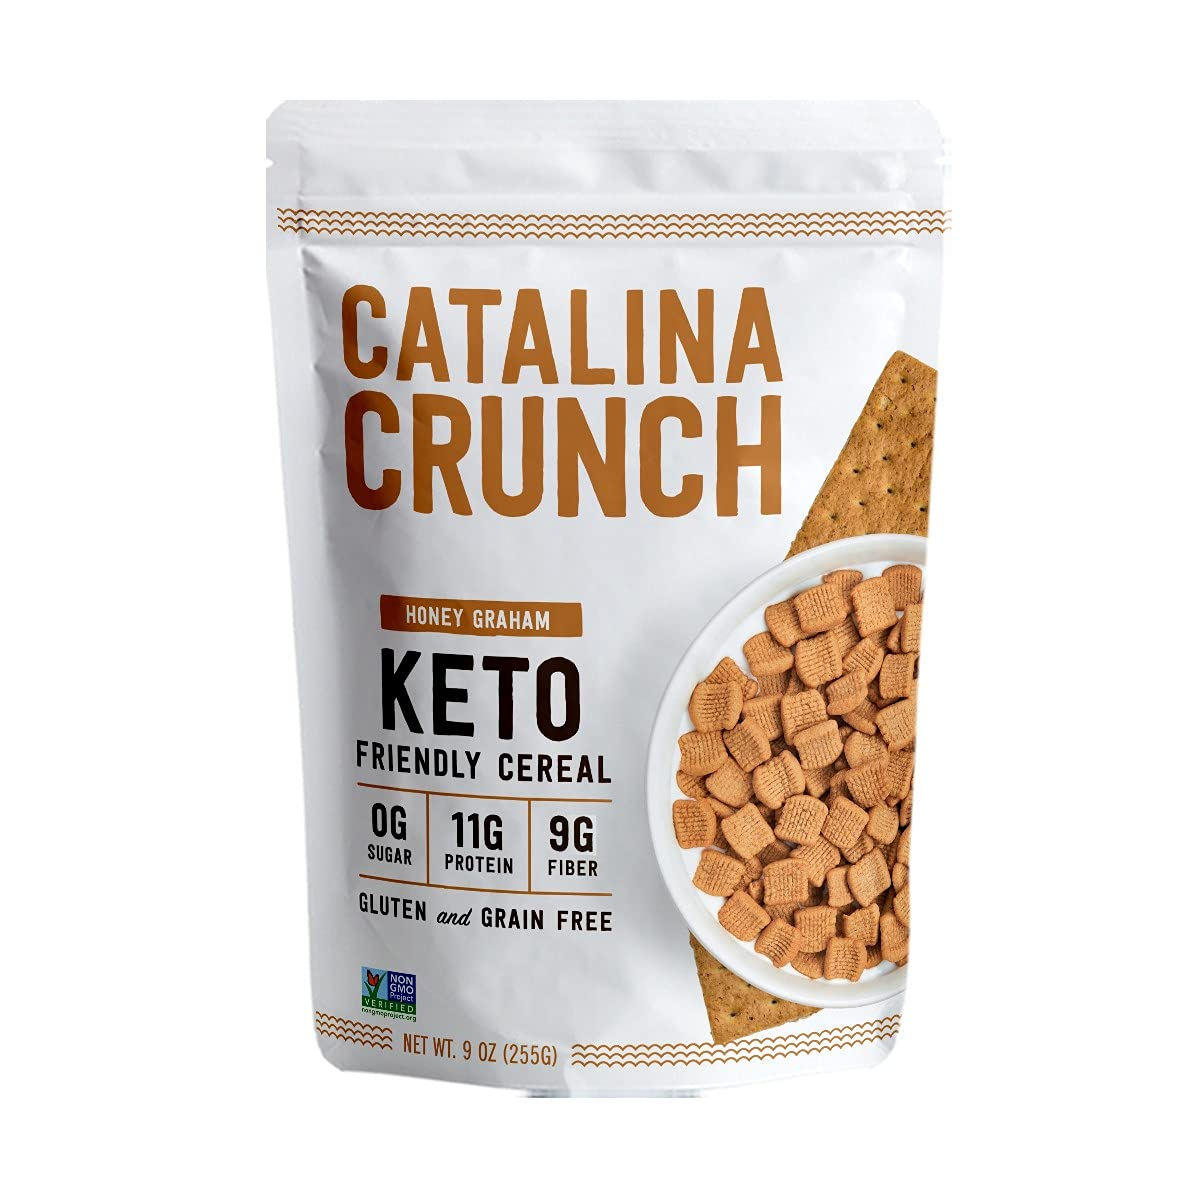 Catalina Crunch Honey Graham Keto Cereal (9oz Bags) | Low Carb, Sugar Free, Gluten Free, Grain Free | Keto Snacks, Vegan, Paleo, Plant Based | Breakfast Cereals | Keto Friendly Food